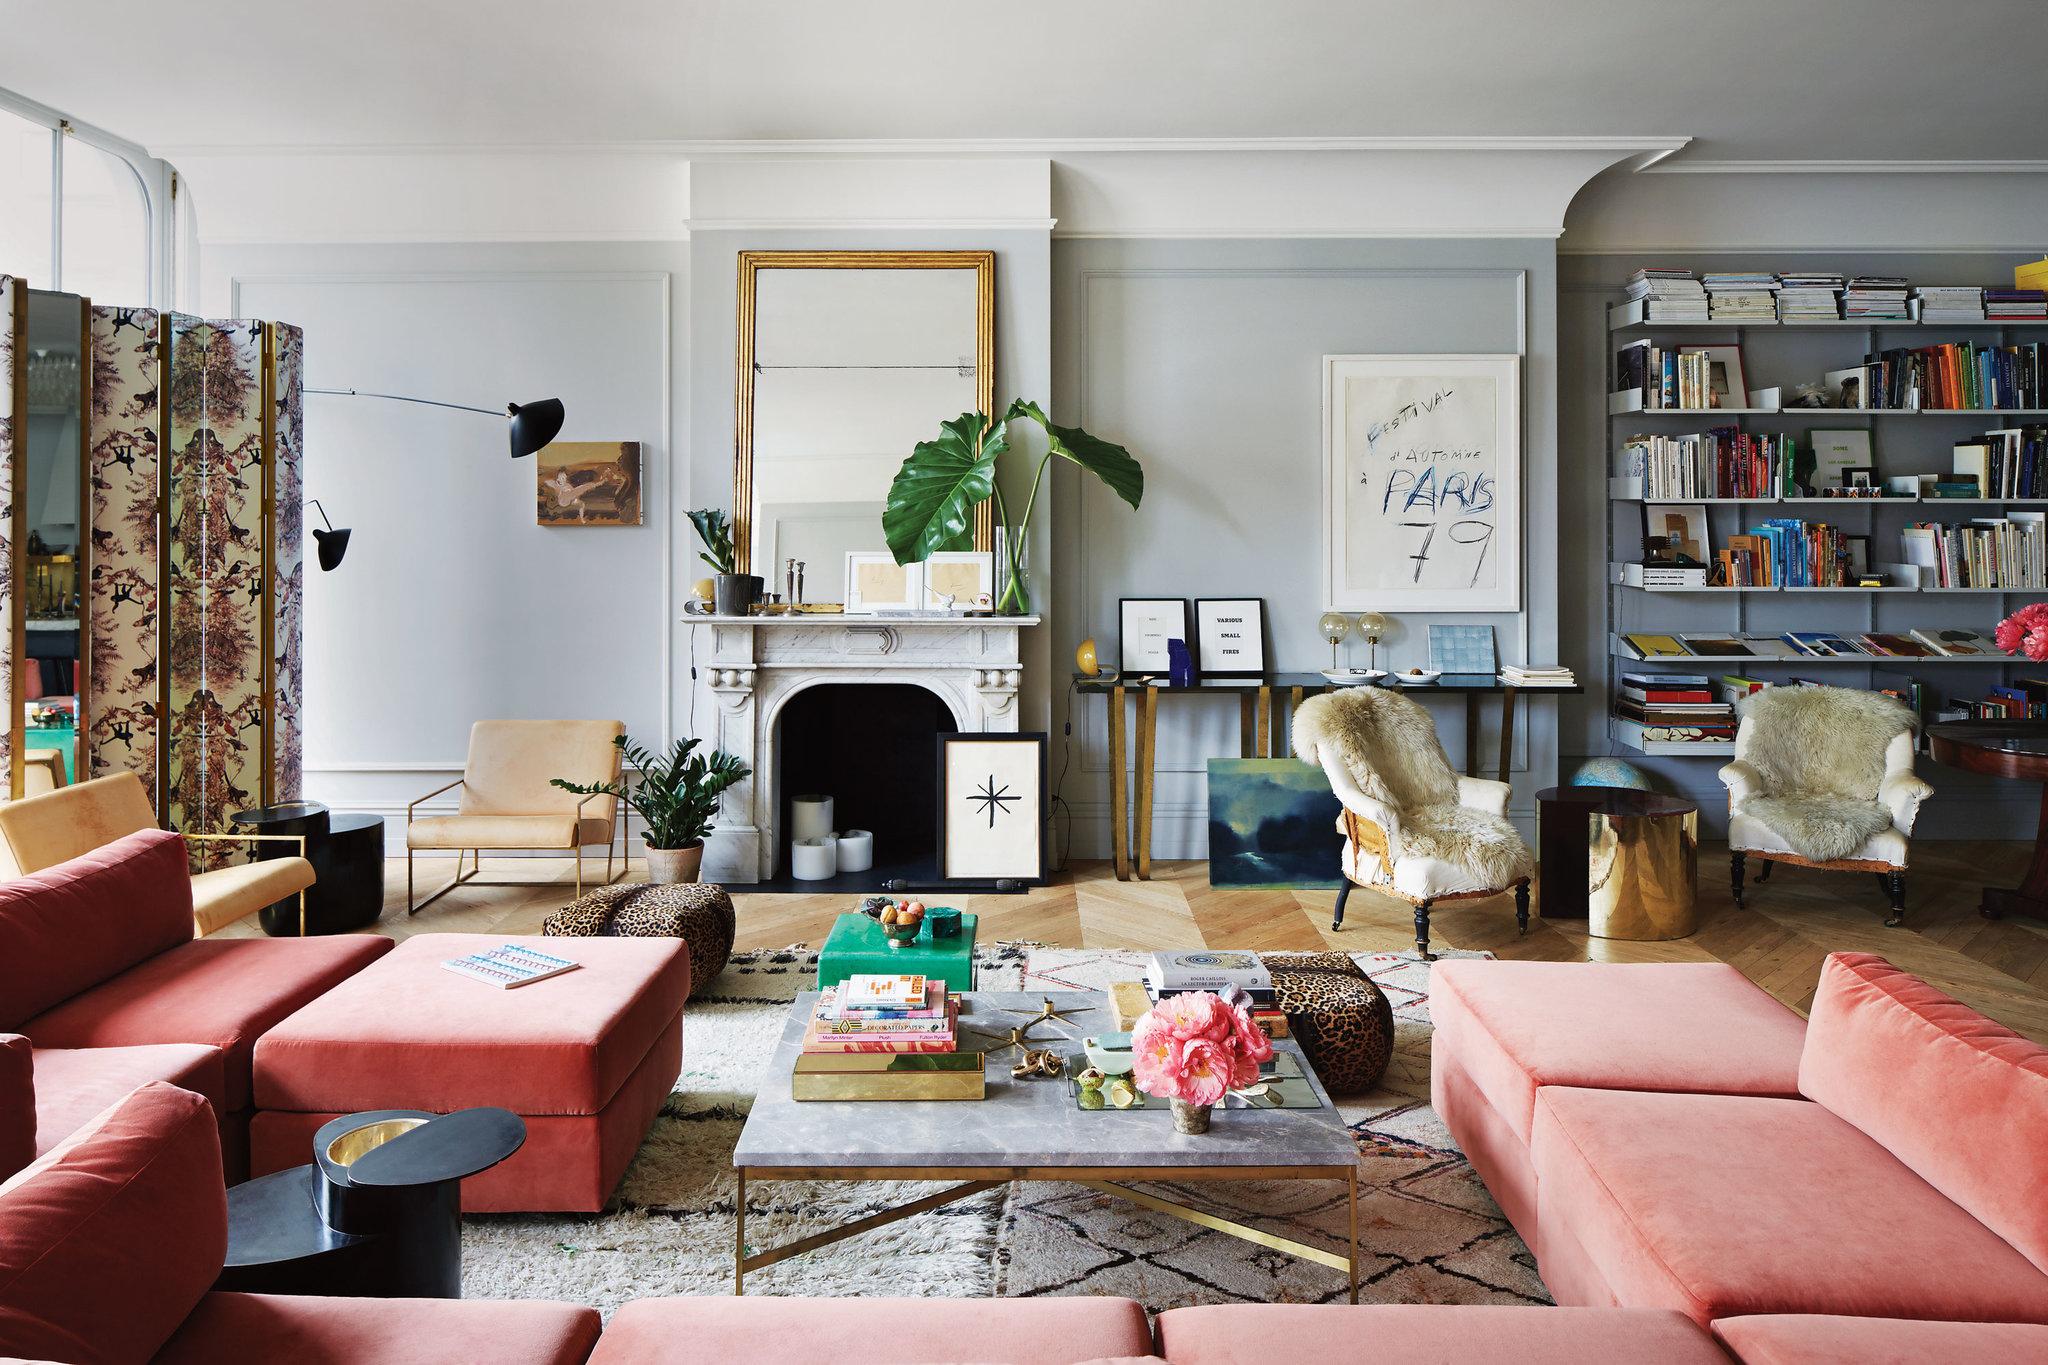 tmag jenna slide FNJY superJumbo - O Apartamento da Jenna Lyons em New York